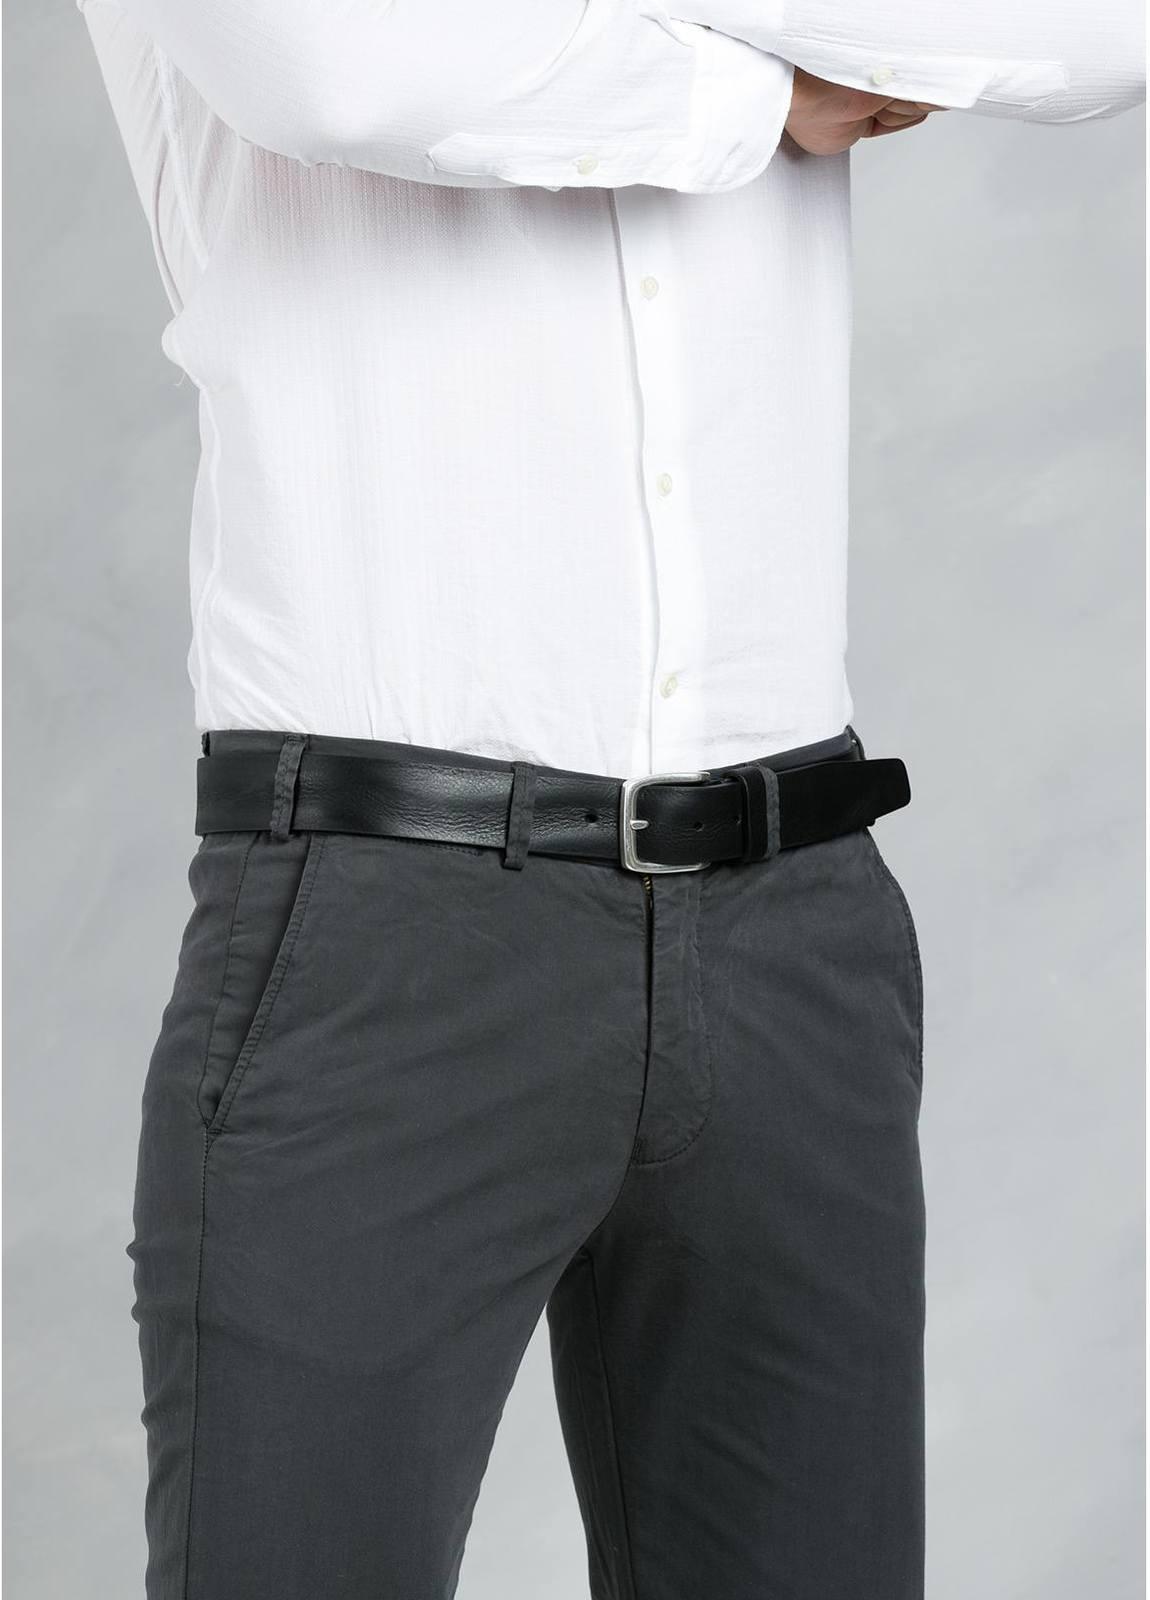 Cinturón Sport piel lisa color negro, 100% piel - Ítem2